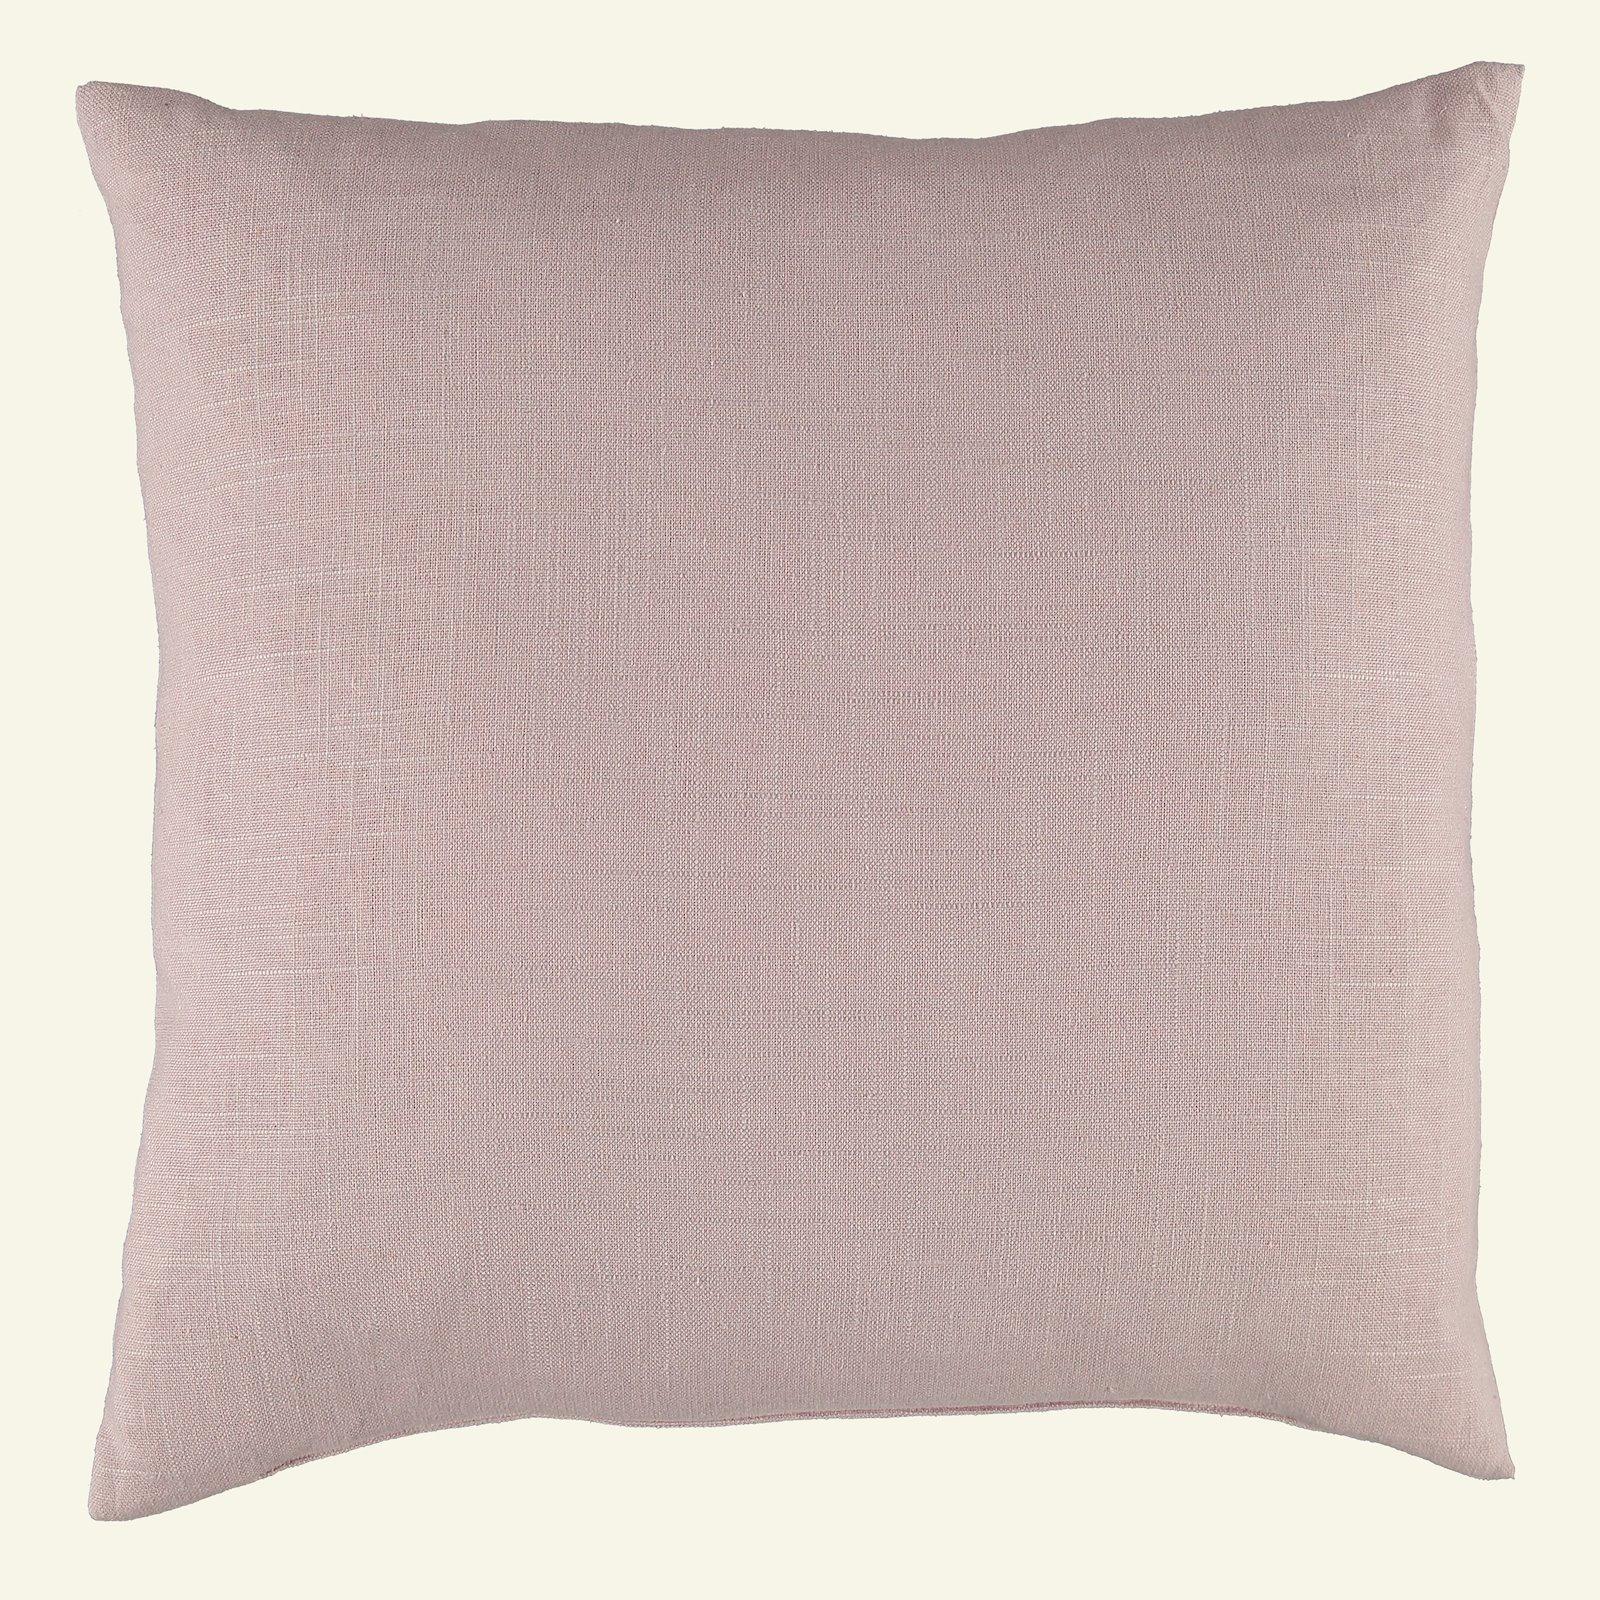 Coarse linen/viscose light dusty violet 852356_sskit